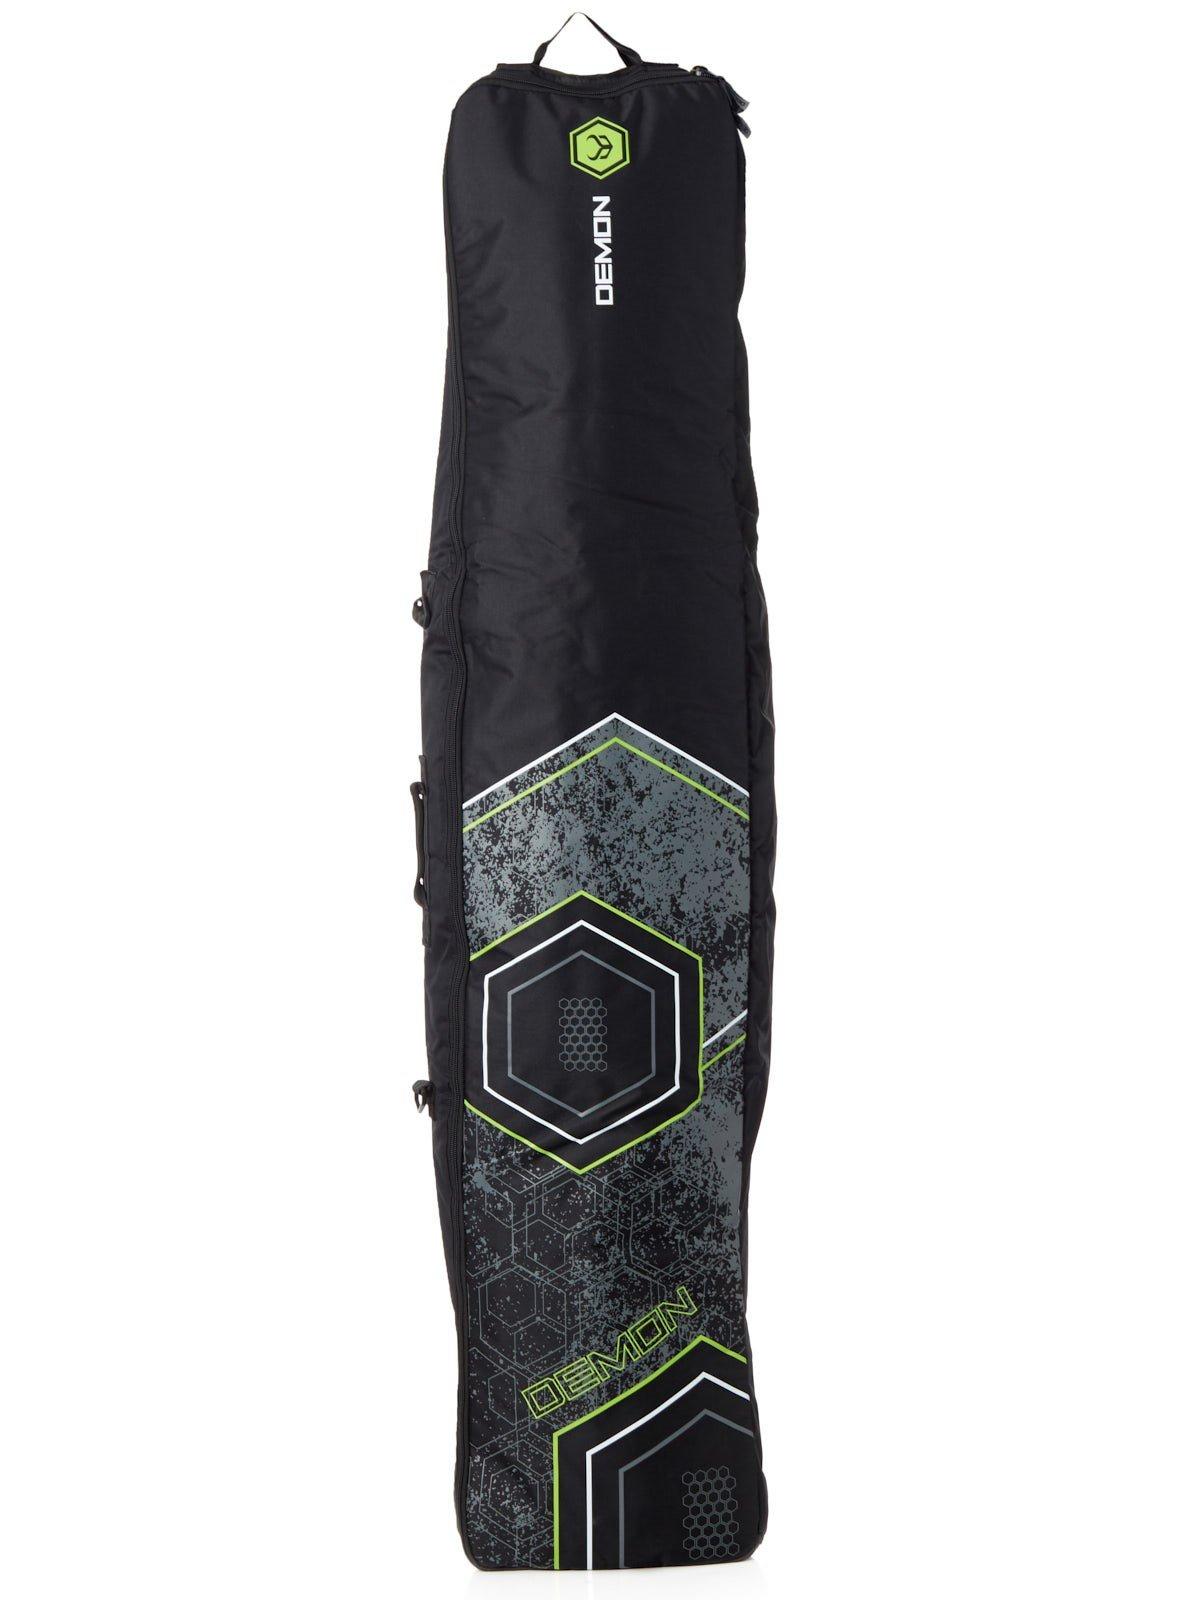 The Sports Emporium Demon Phantom Sleeve Snowboard Bag